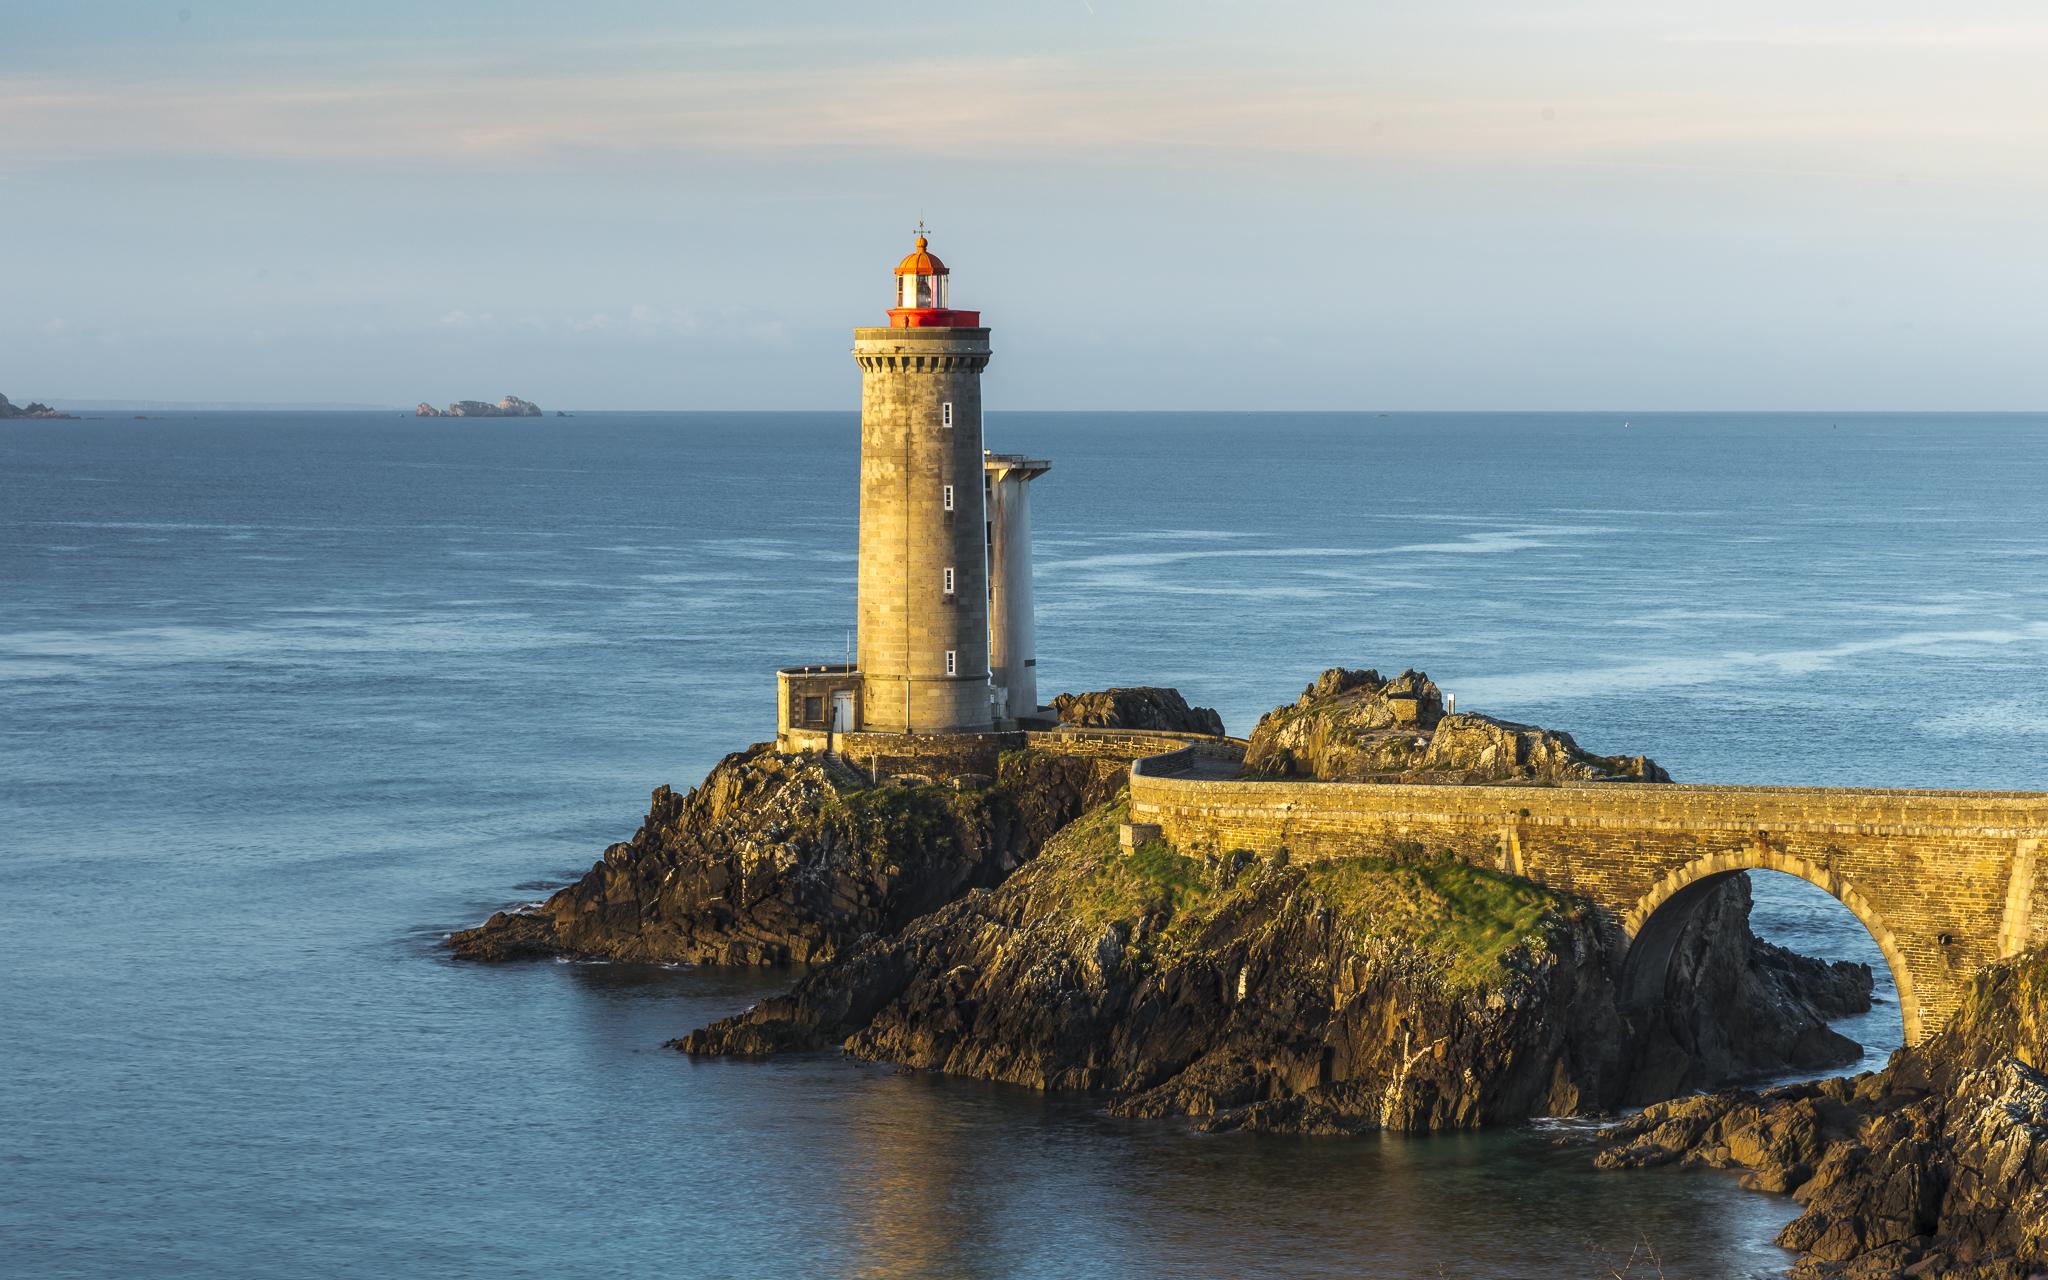 Phare du Petit Minou in the early morning sun, Finistère, France